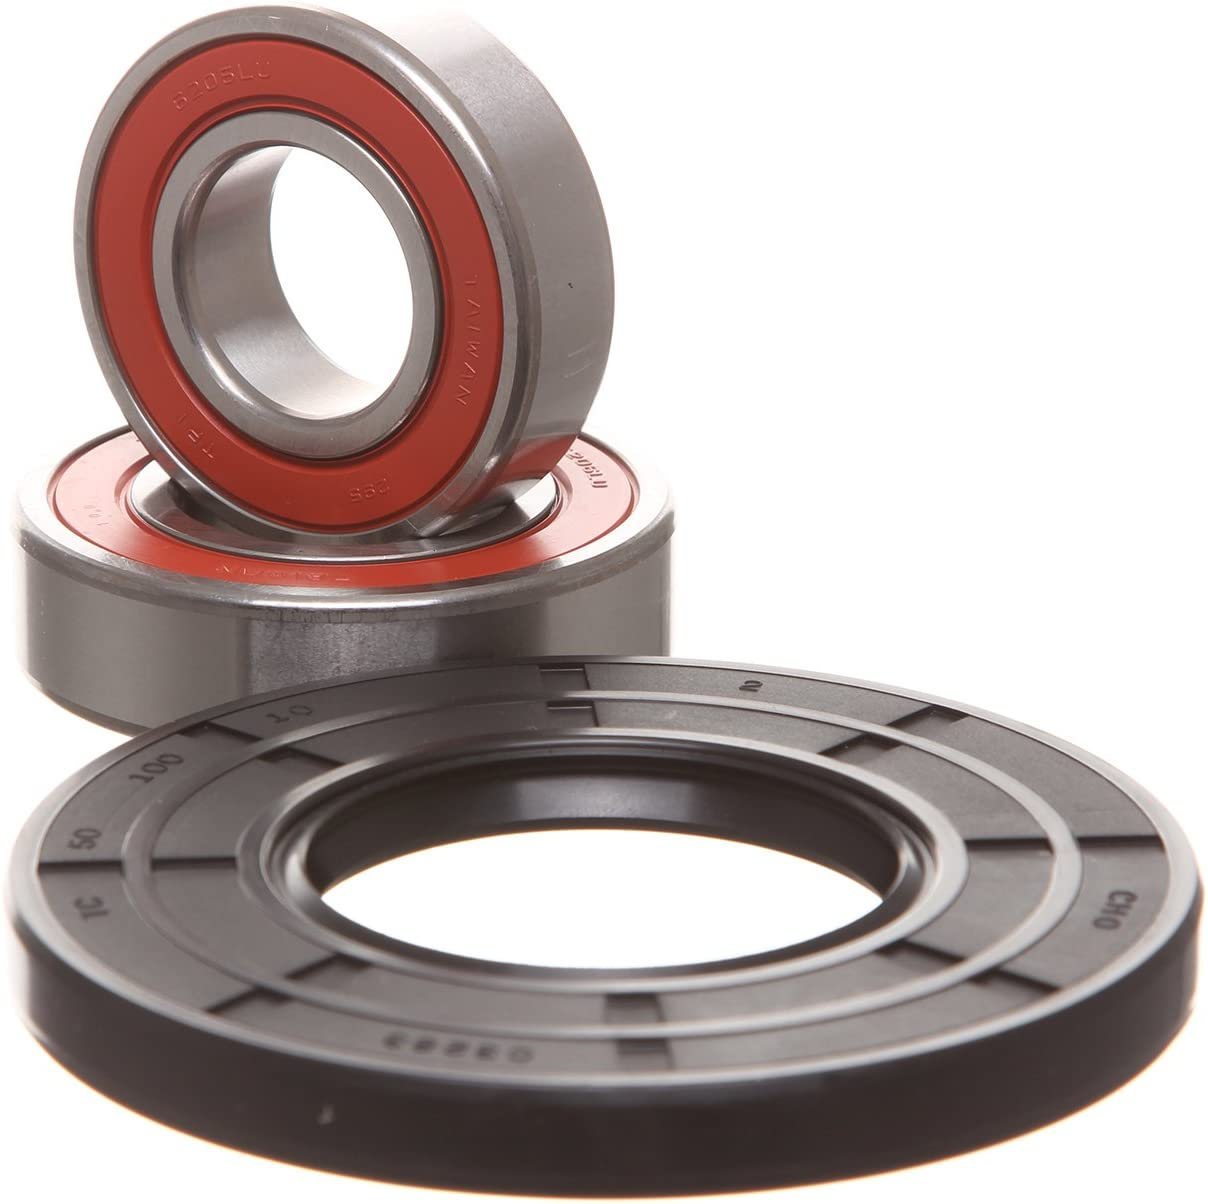 REPLACEMENTKITS.COM - Brand fits Whirlpool Duet & Maytag HE3 Bearing & Seal Kit - Black